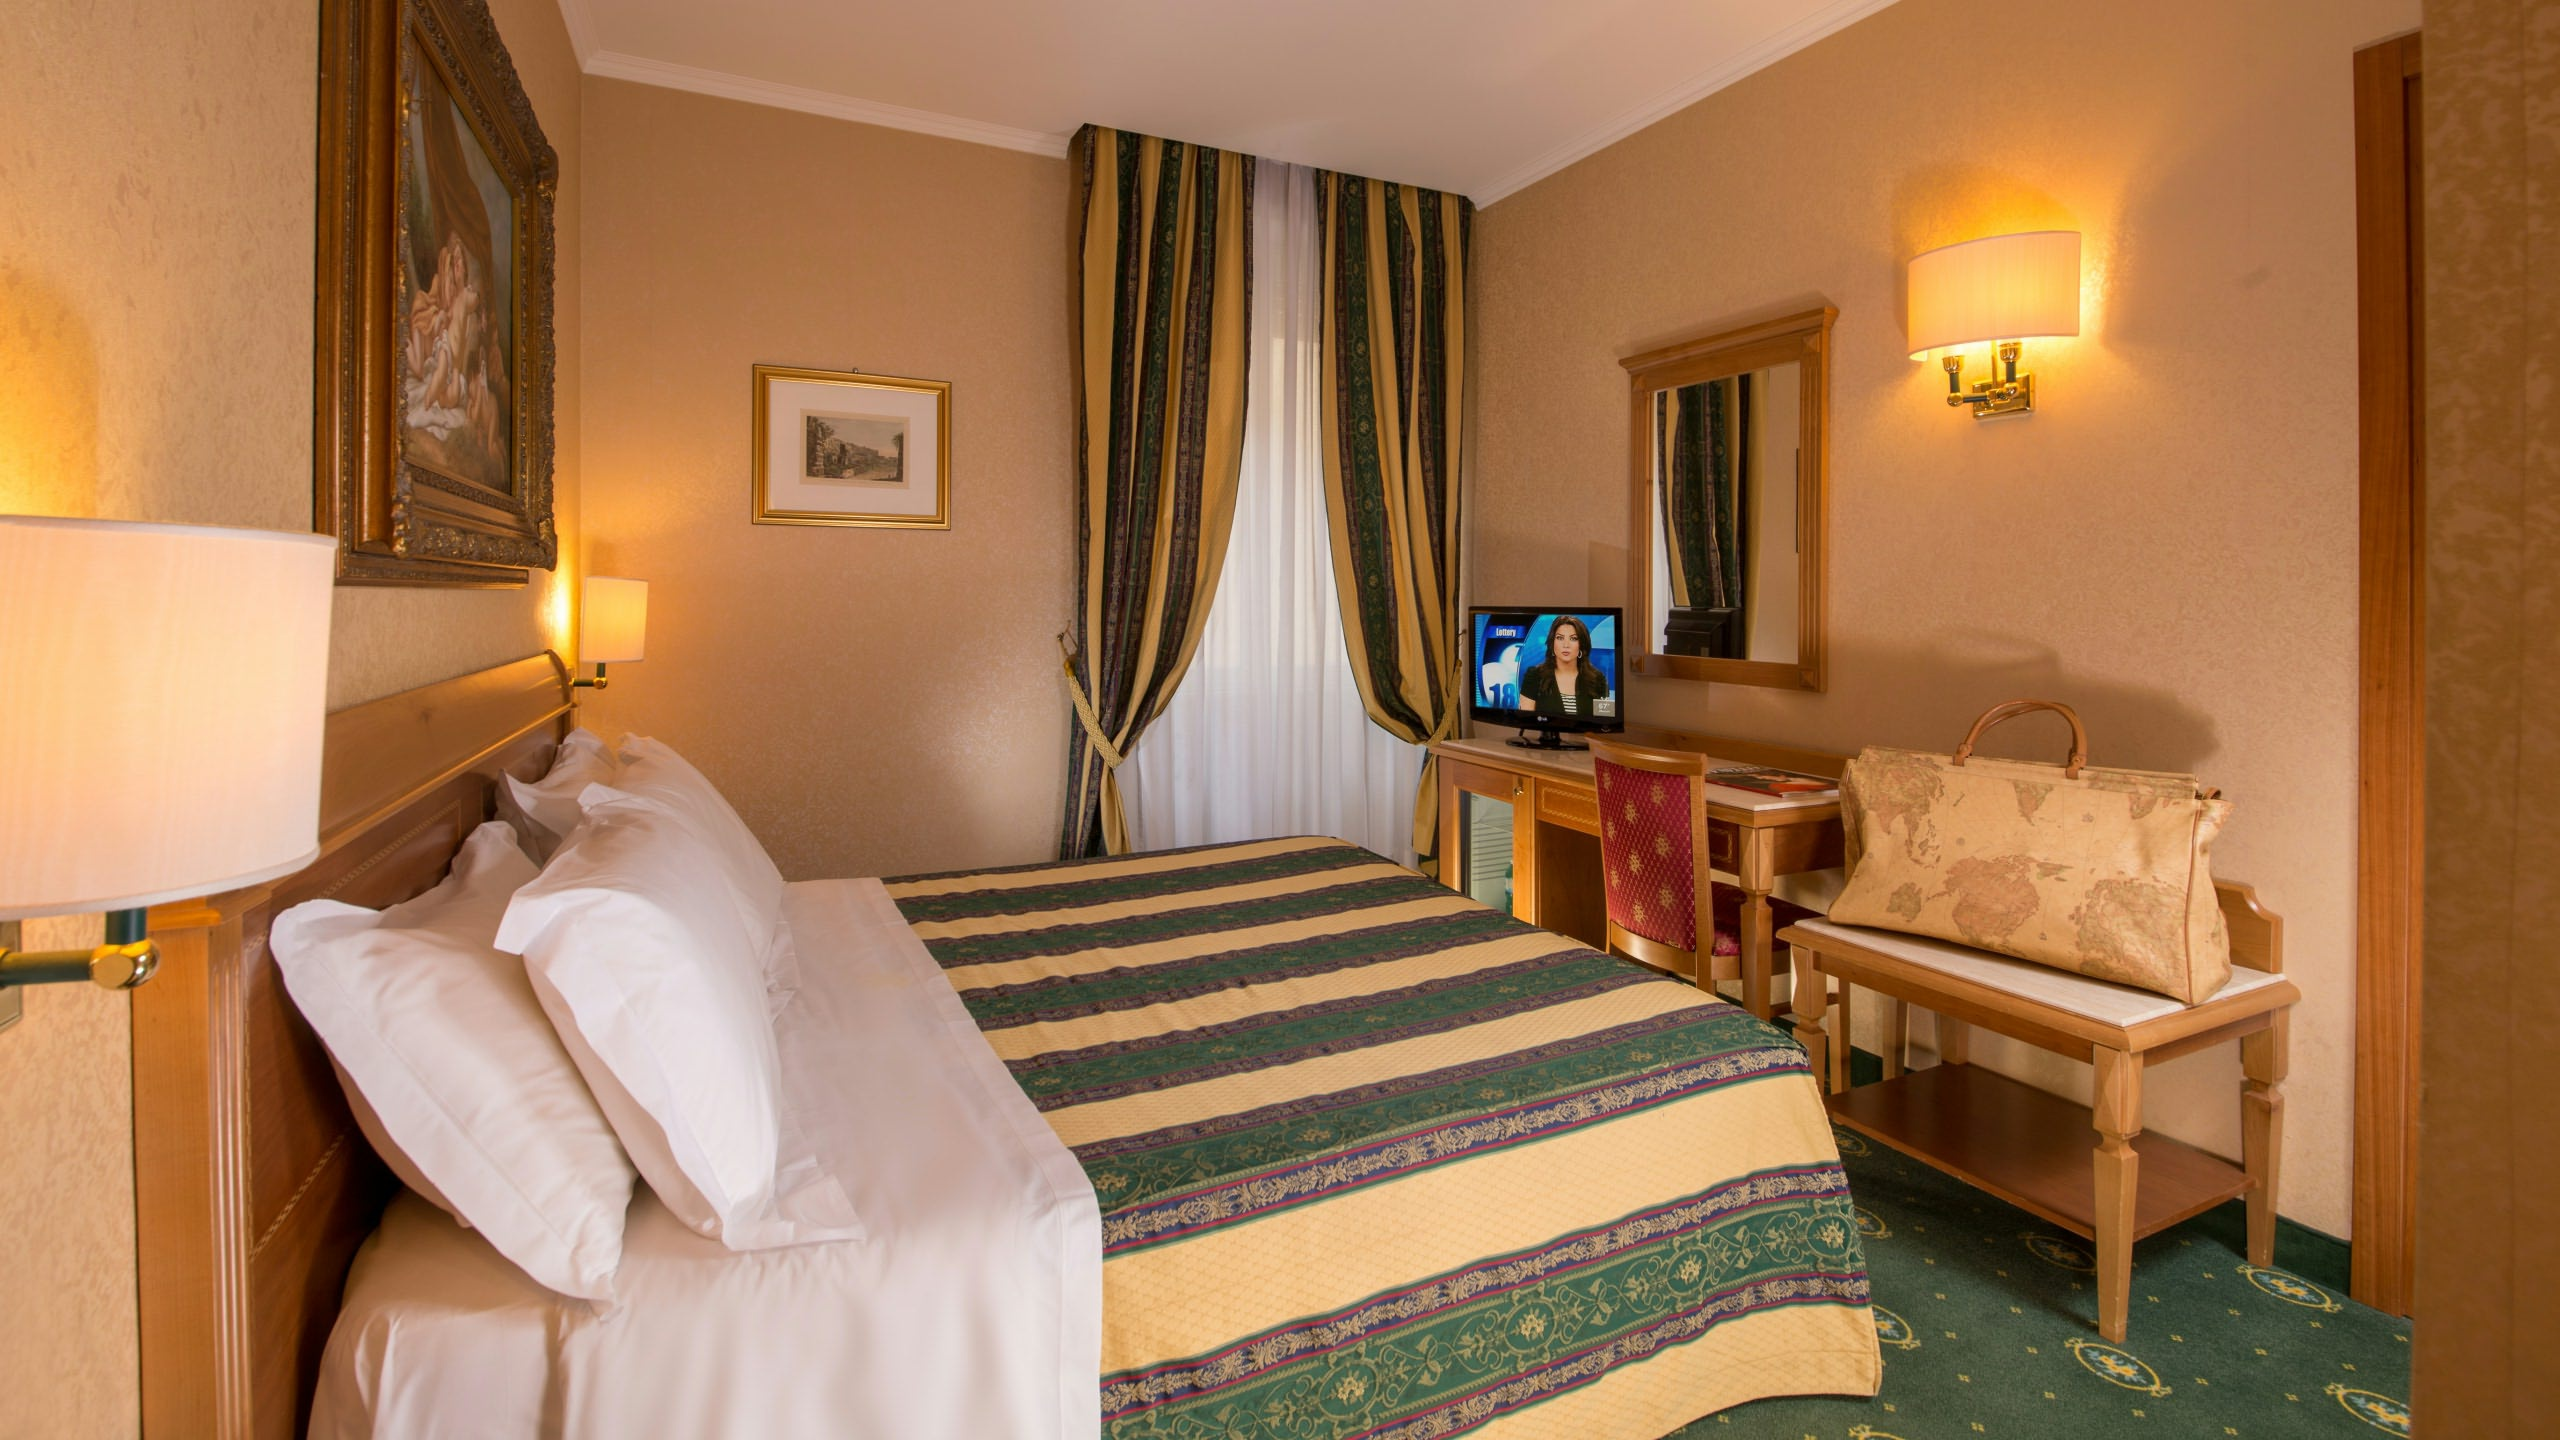 Hotel-Colonna-Frascati-room-13